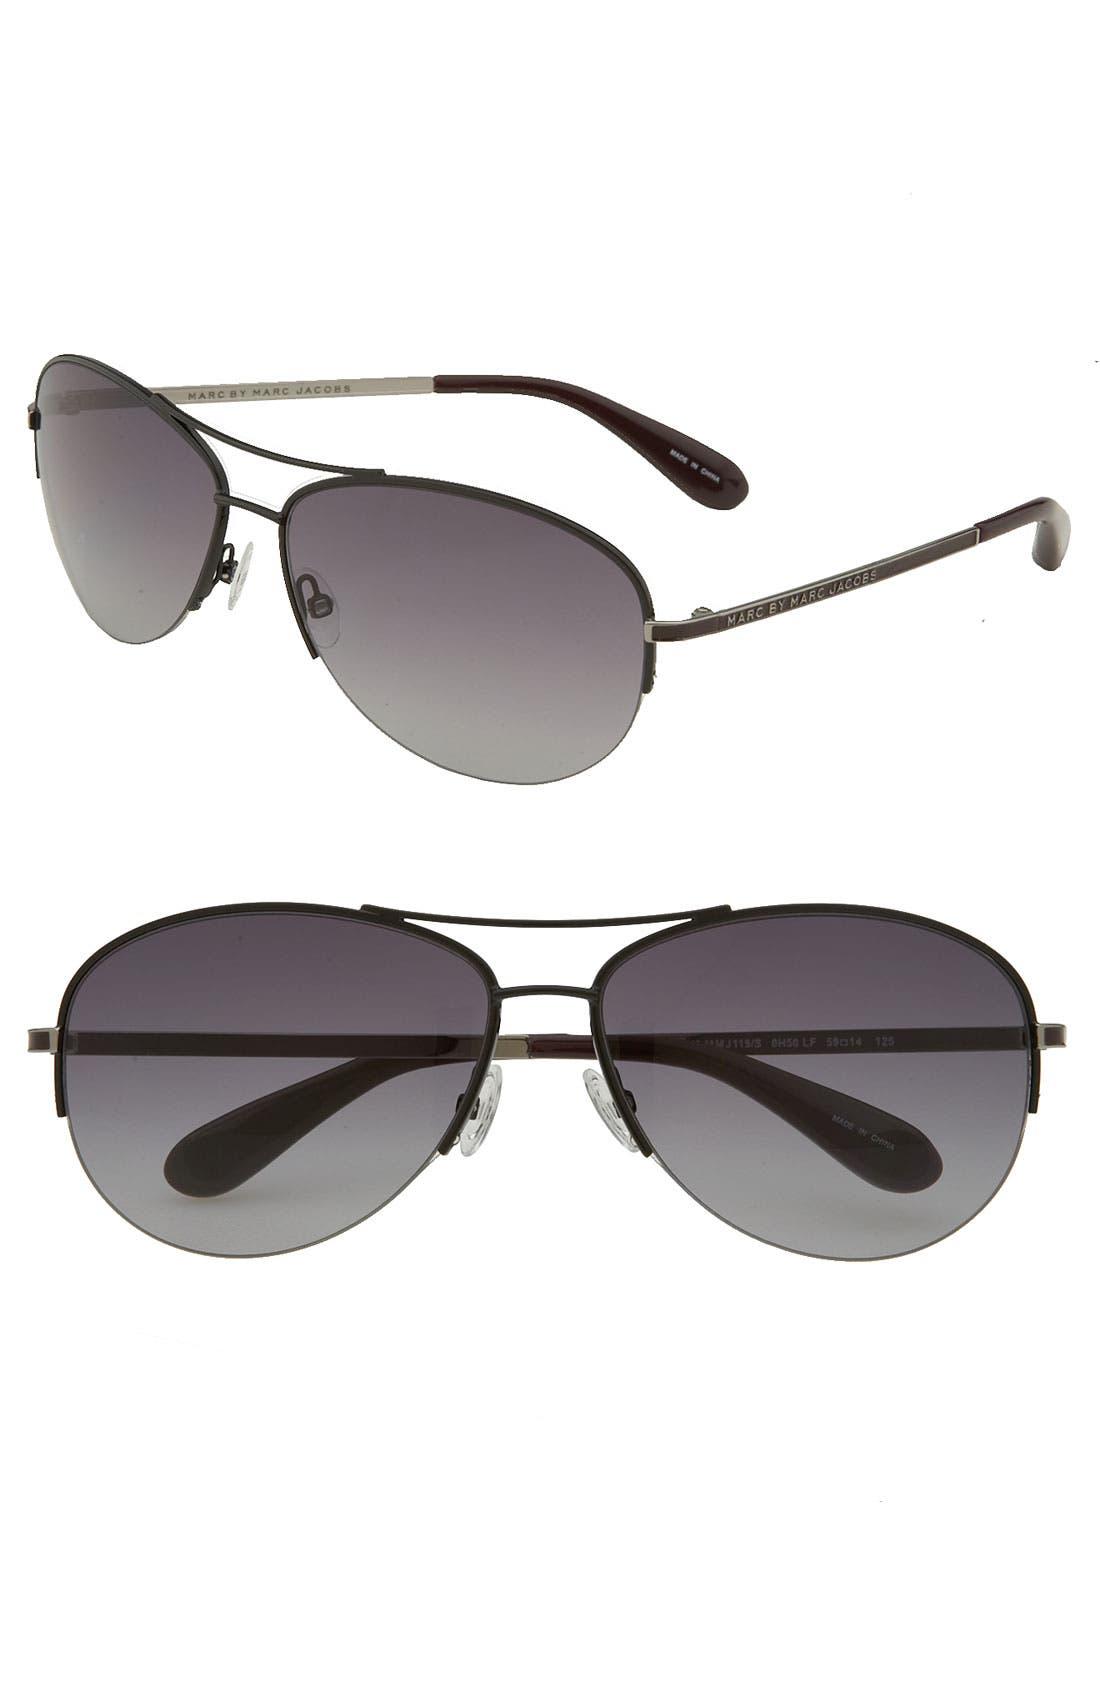 59mm Rimless Aviator Sunglasses,                             Main thumbnail 1, color,                             001